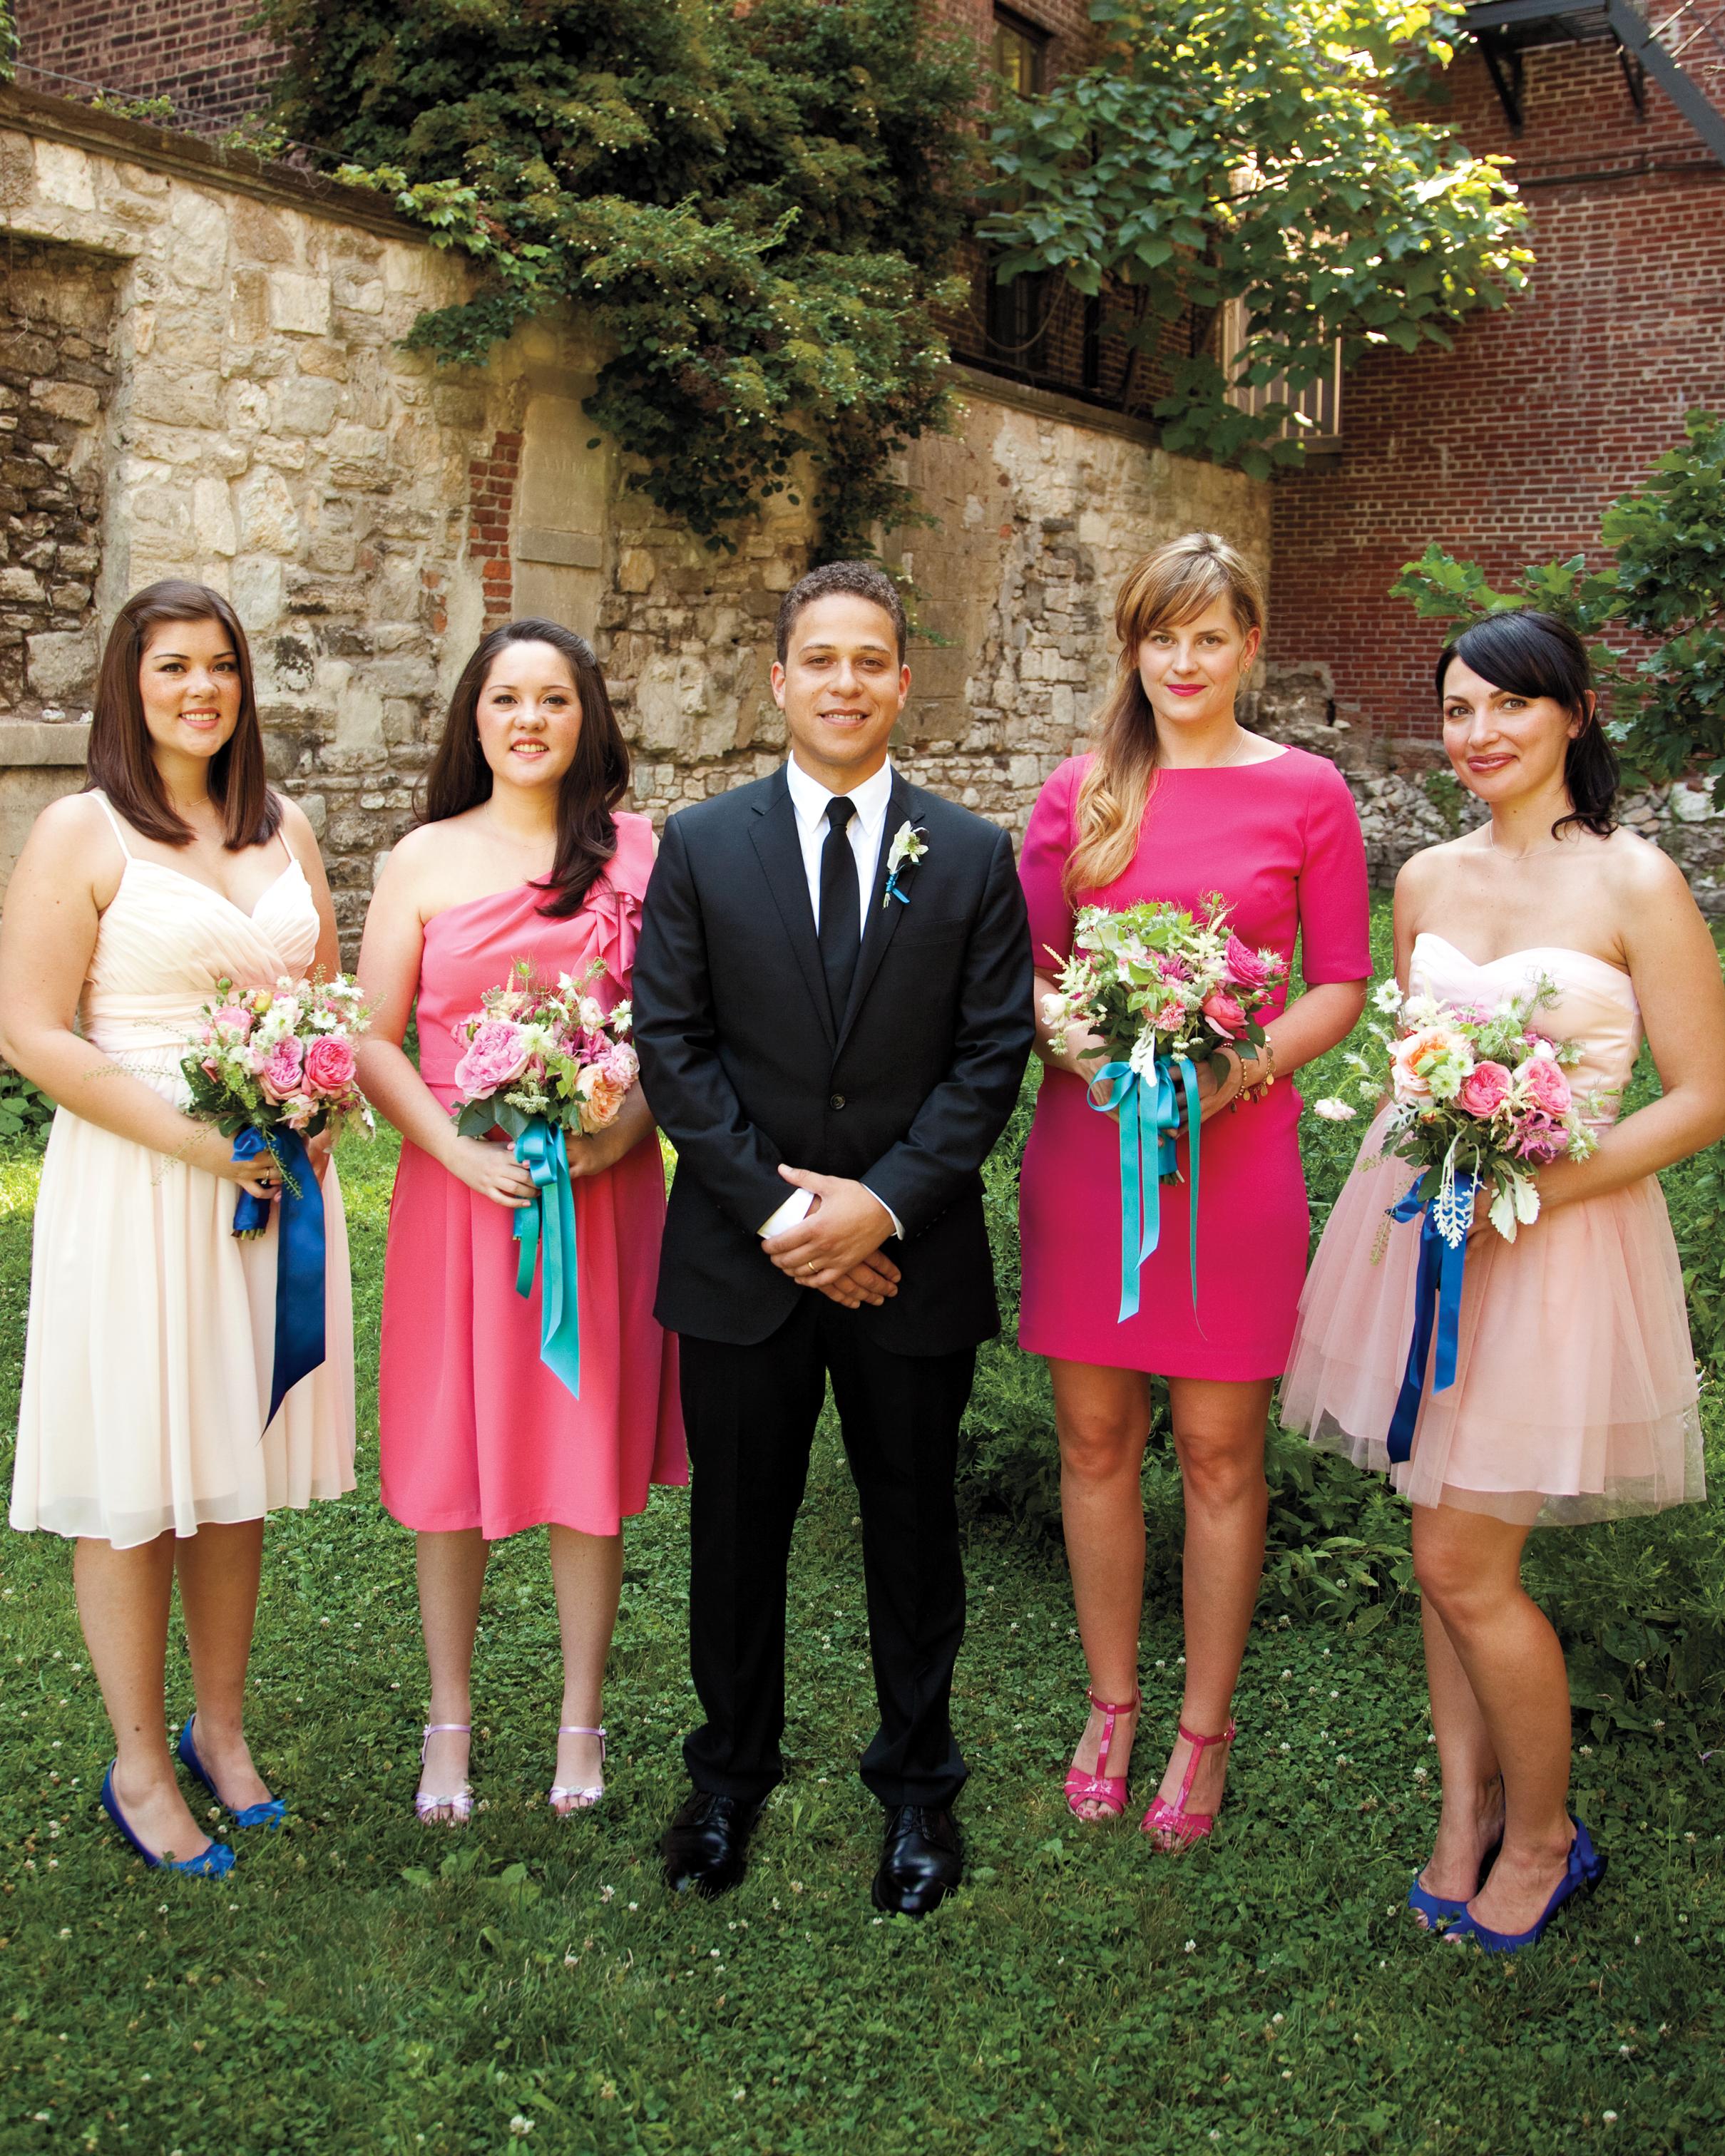 bridal-party-004-mwd10900620.jpg